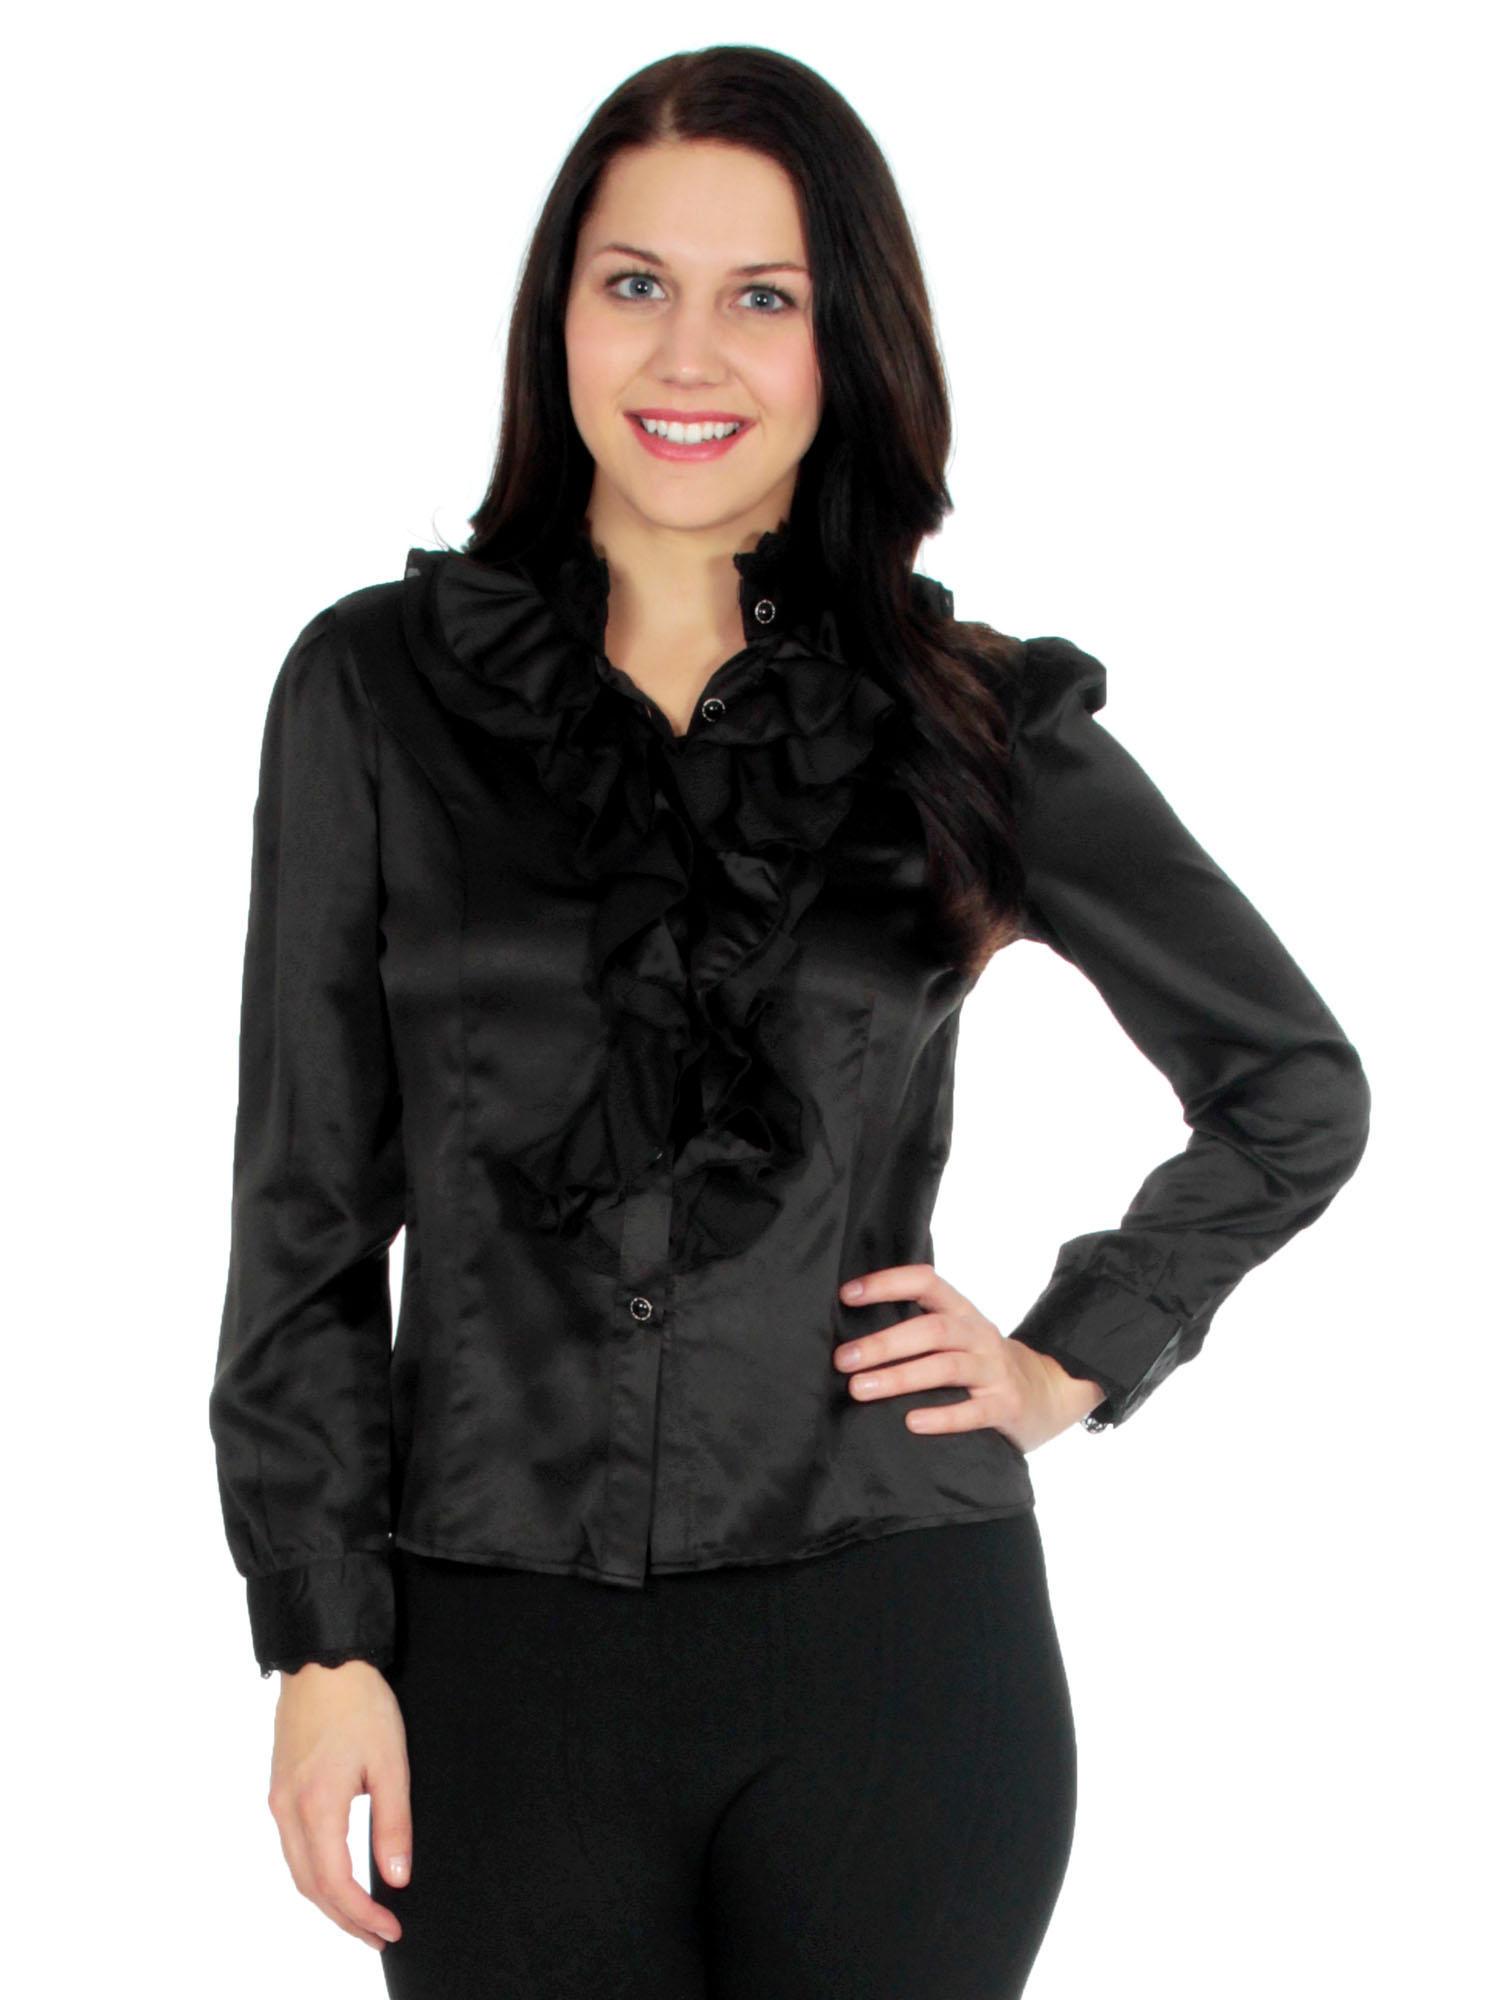 Ruffle Front Collar Shirt - Women's Dress Blouses and Tops